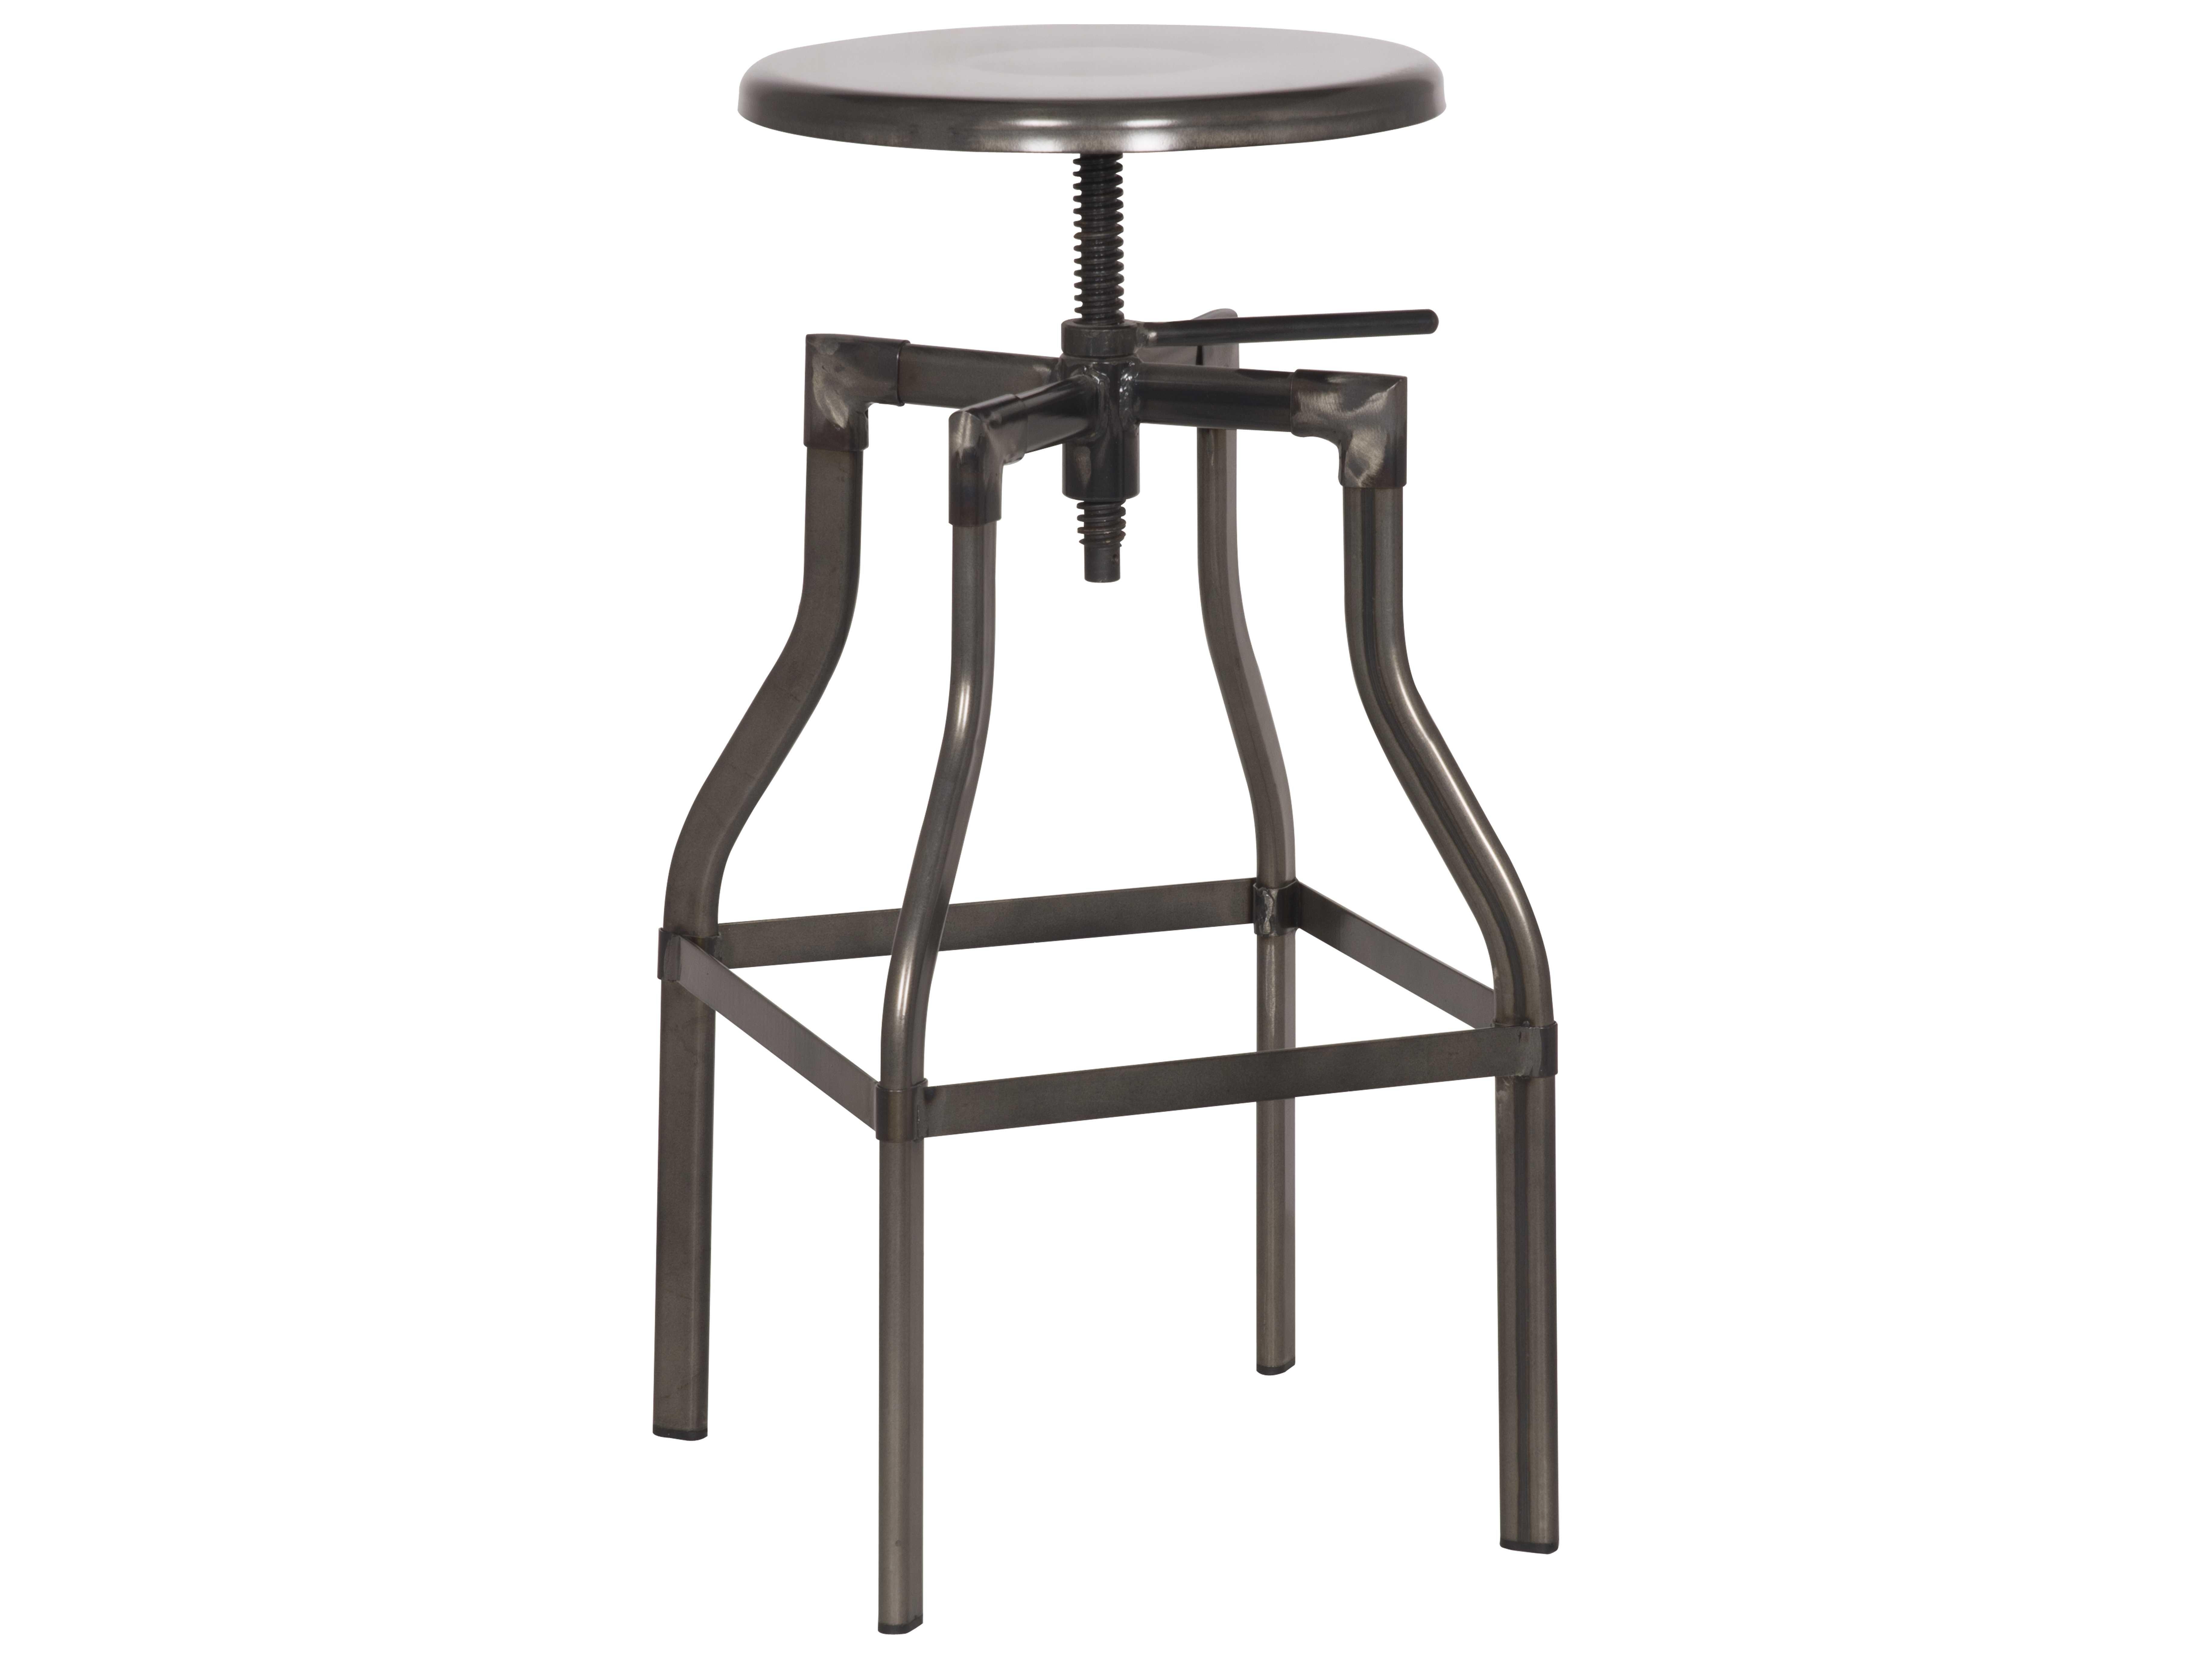 Moeus home collection thomas steel adjustable stool mark bean